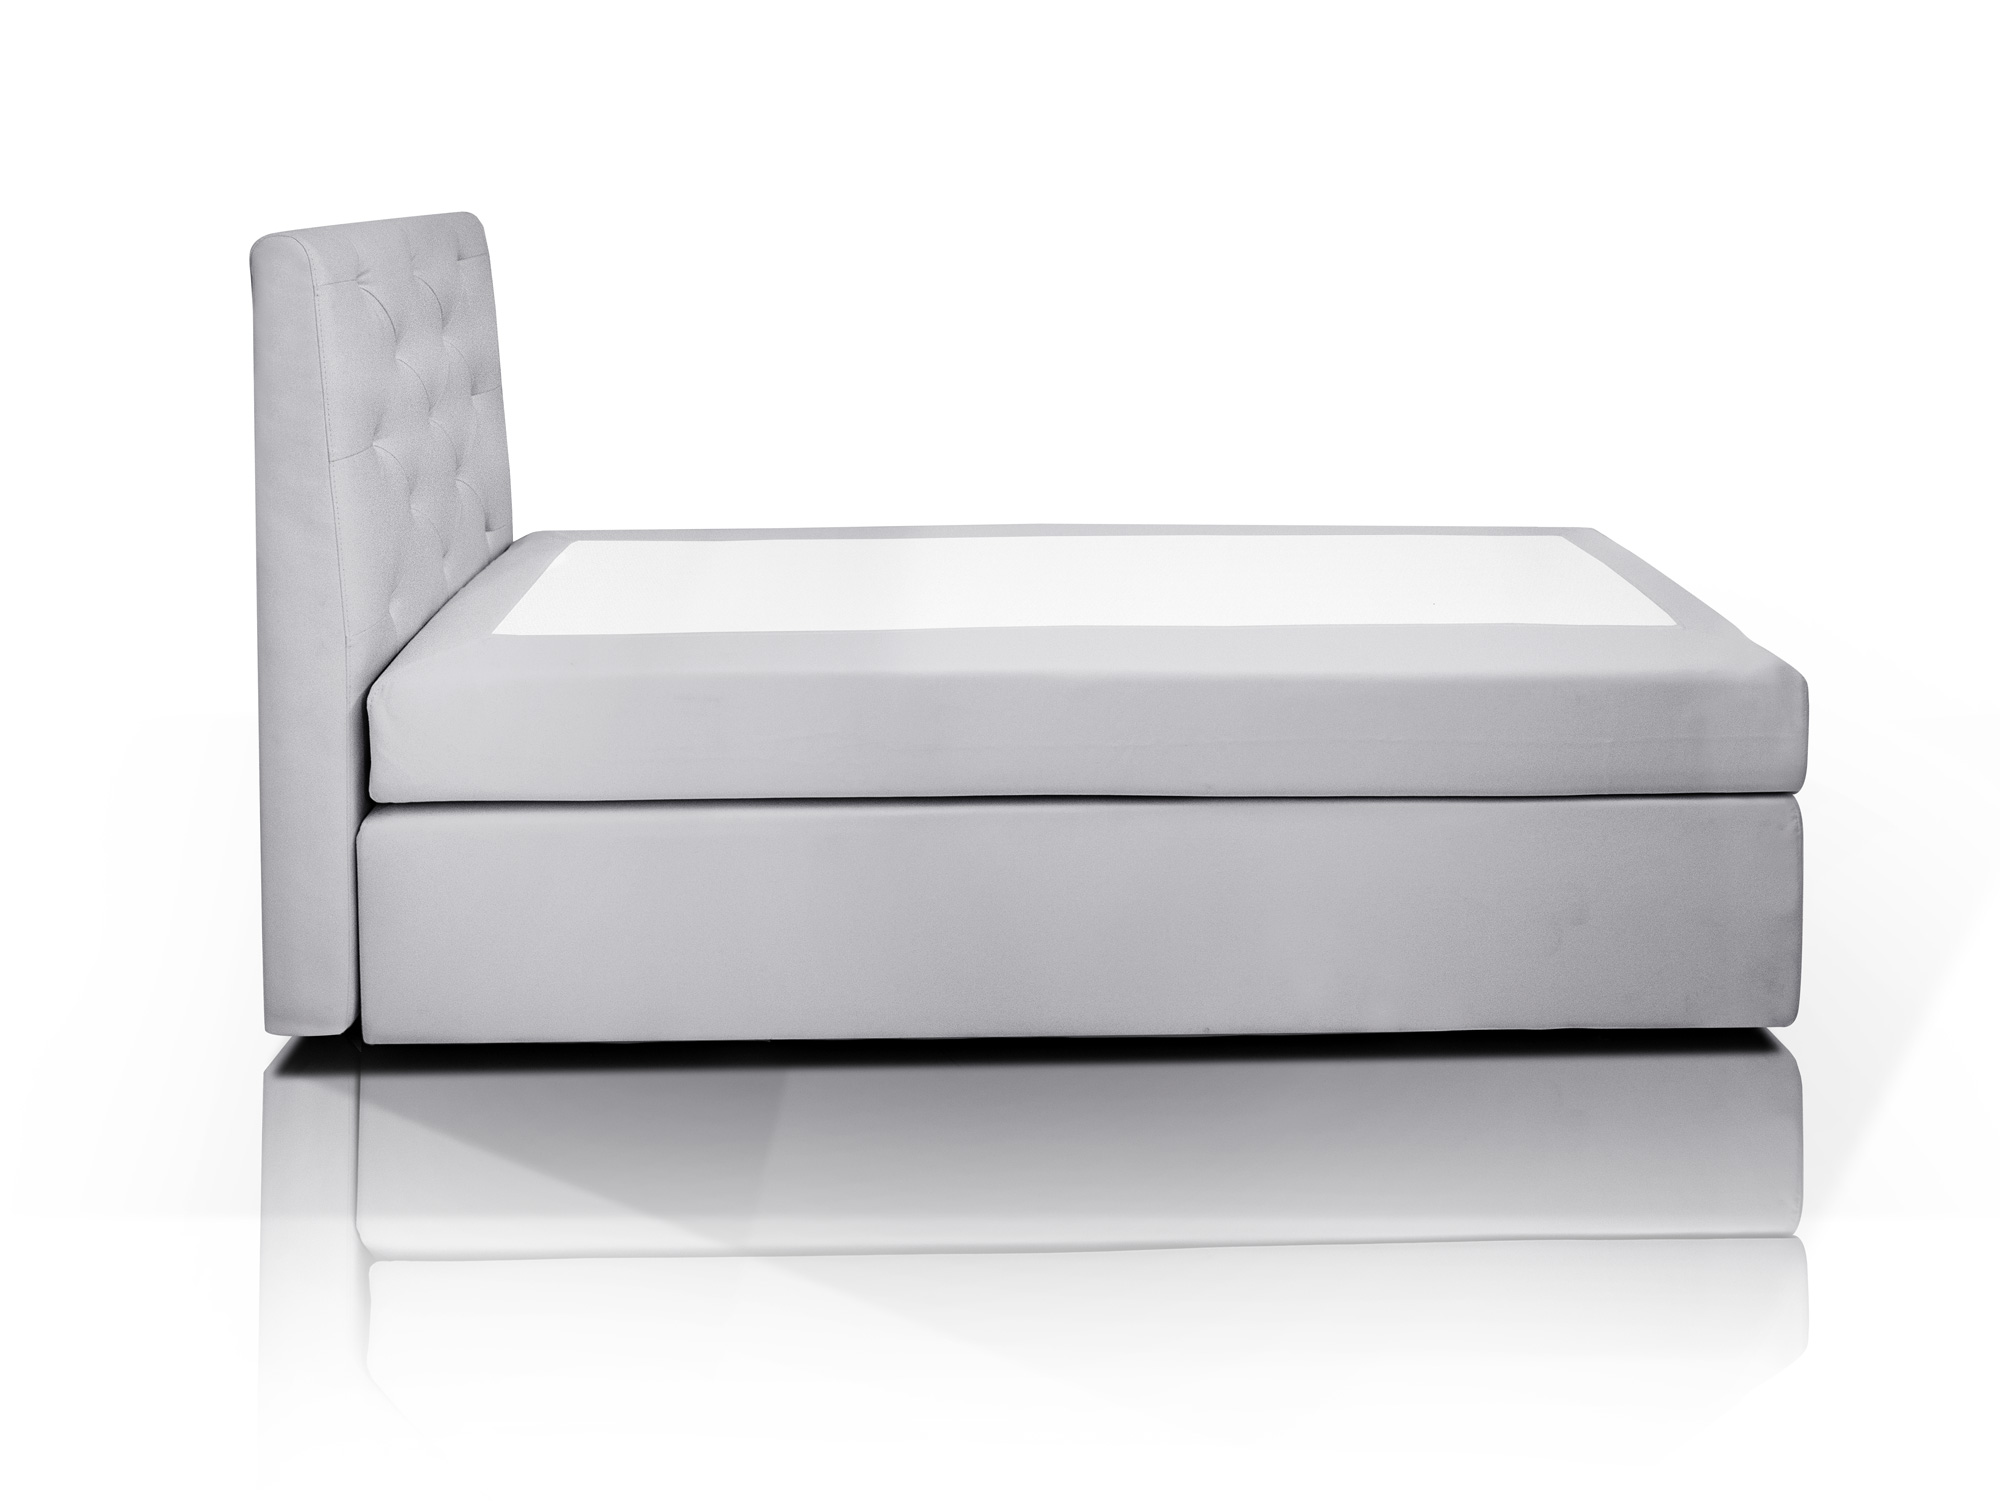 hotel boxspringbett webstoffbezug 80 x 200 cm grau h rtegrad 2. Black Bedroom Furniture Sets. Home Design Ideas